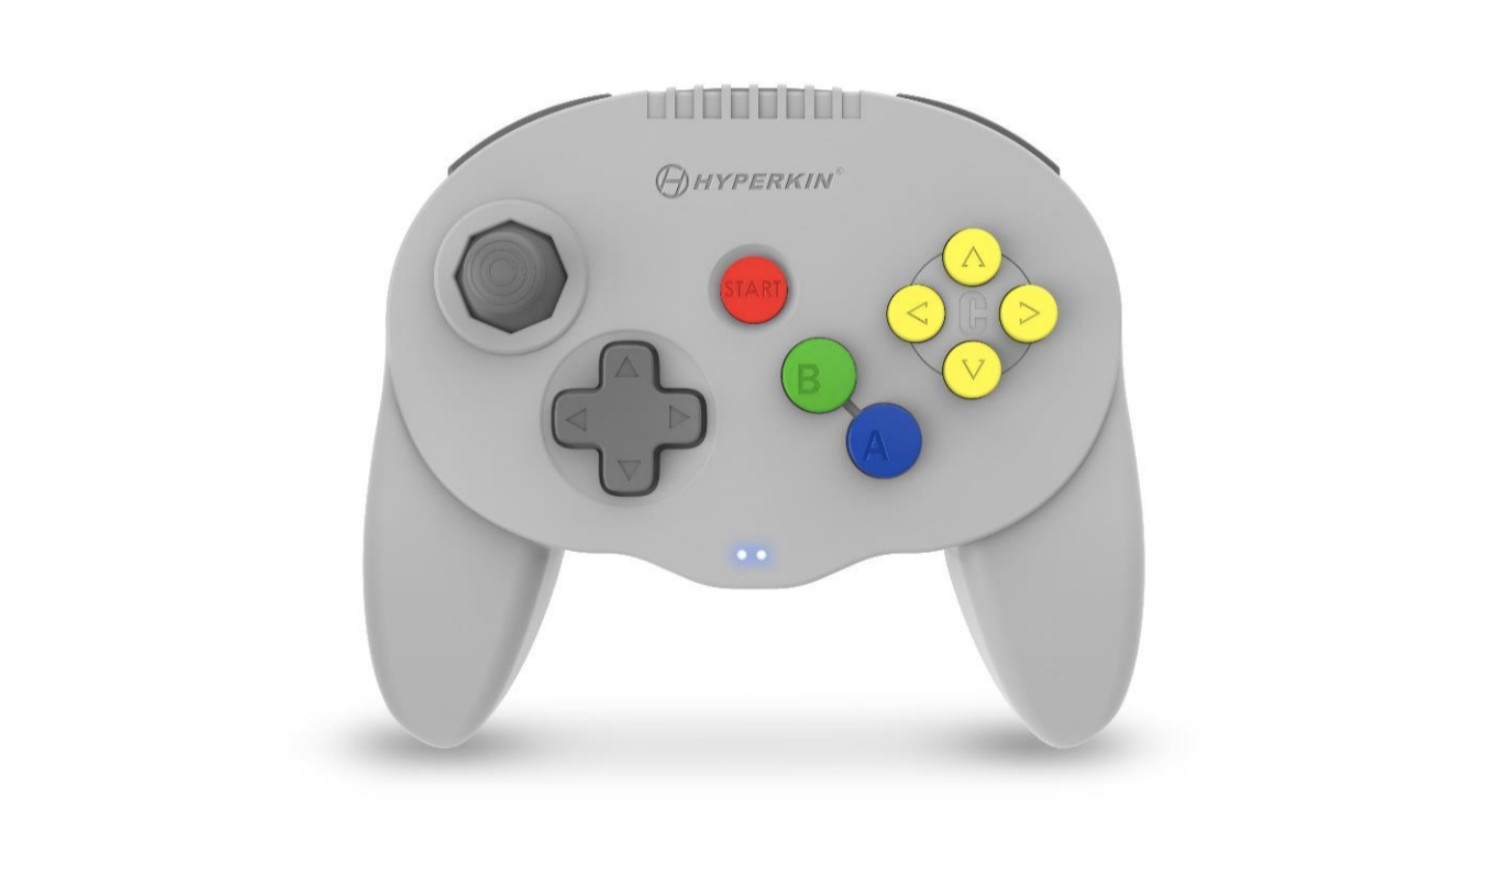 Wireless N64 controller